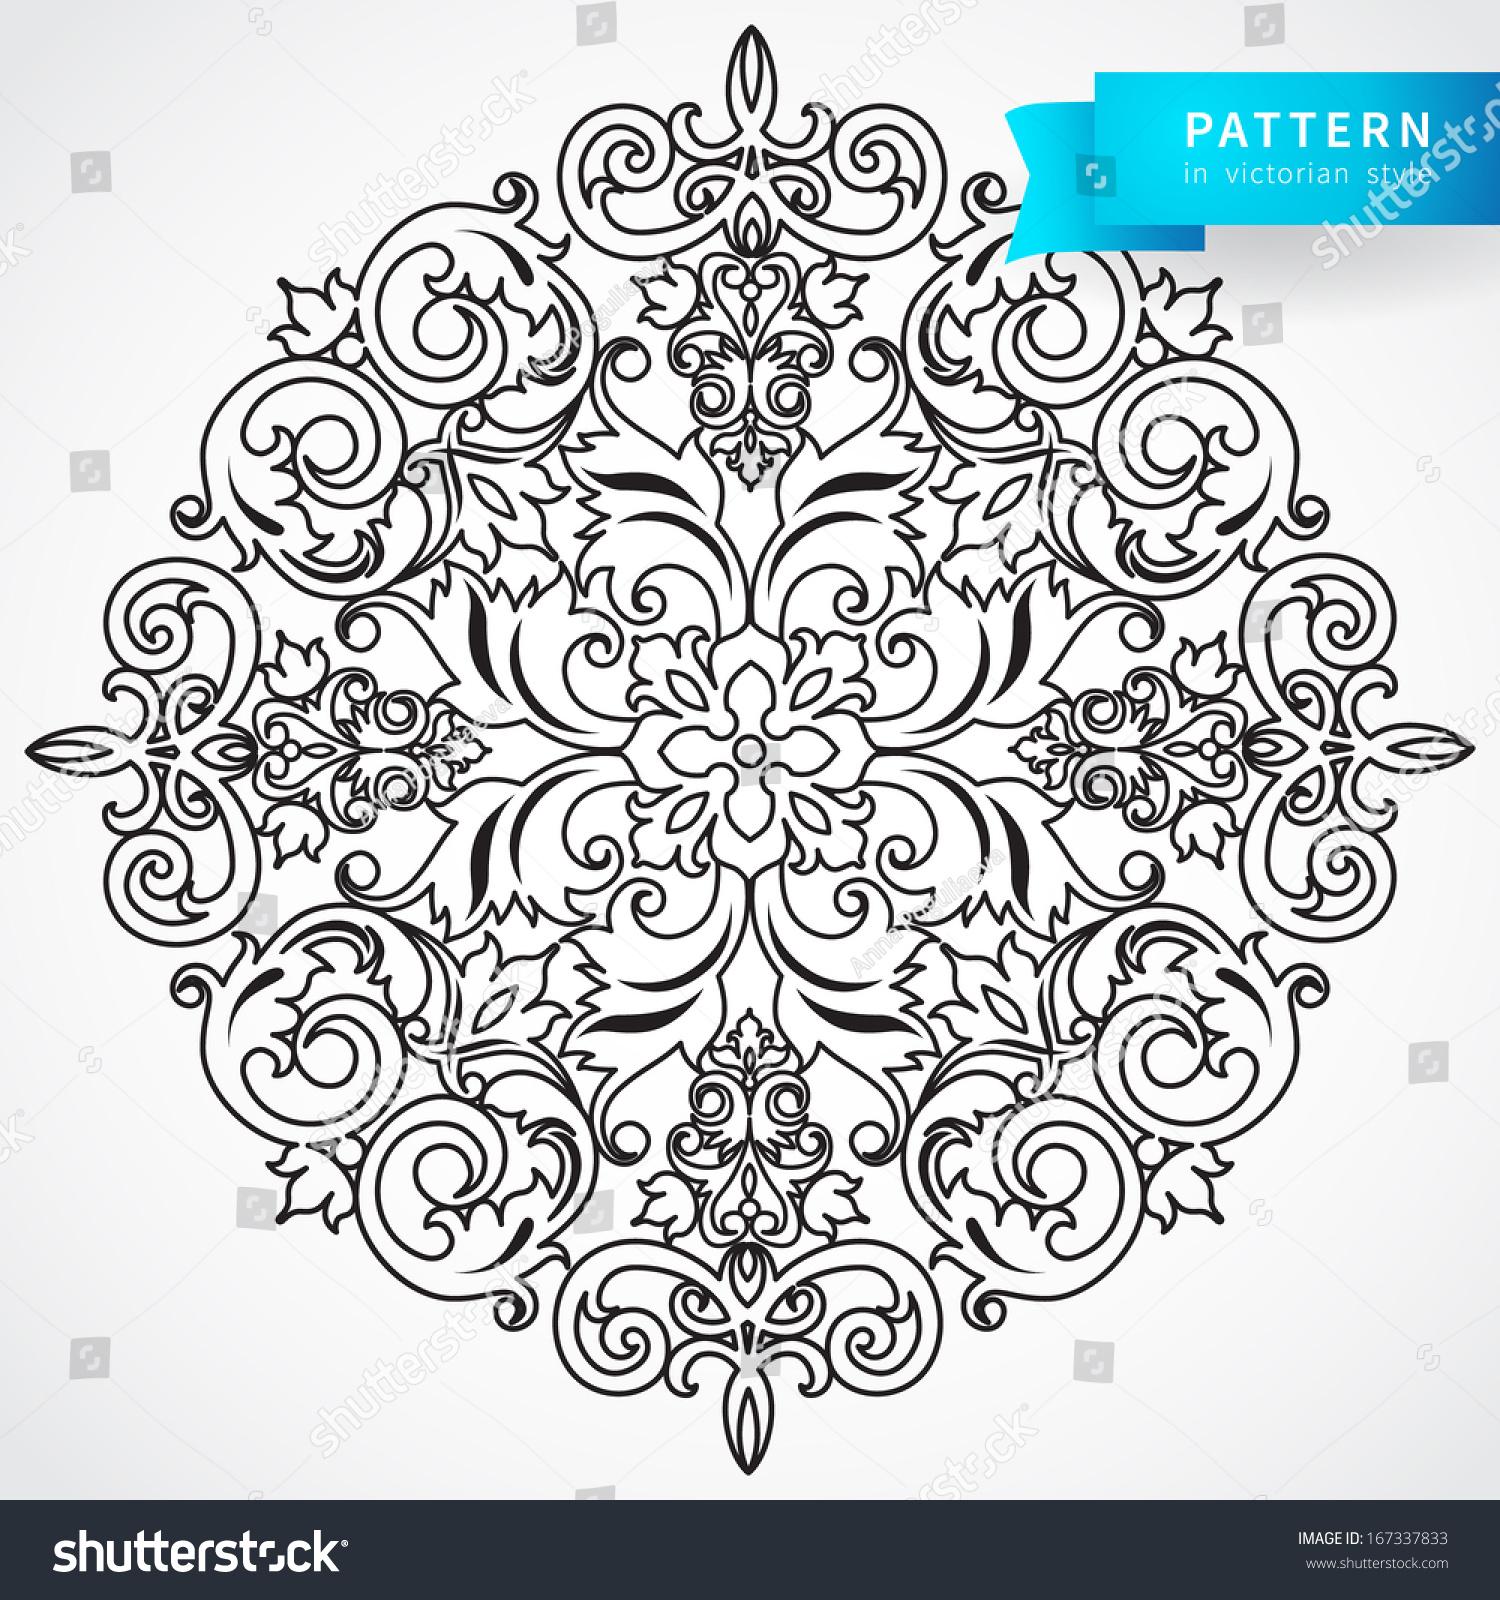 Vector baroque ornament victorian style ornate stock for Baroque design clothes